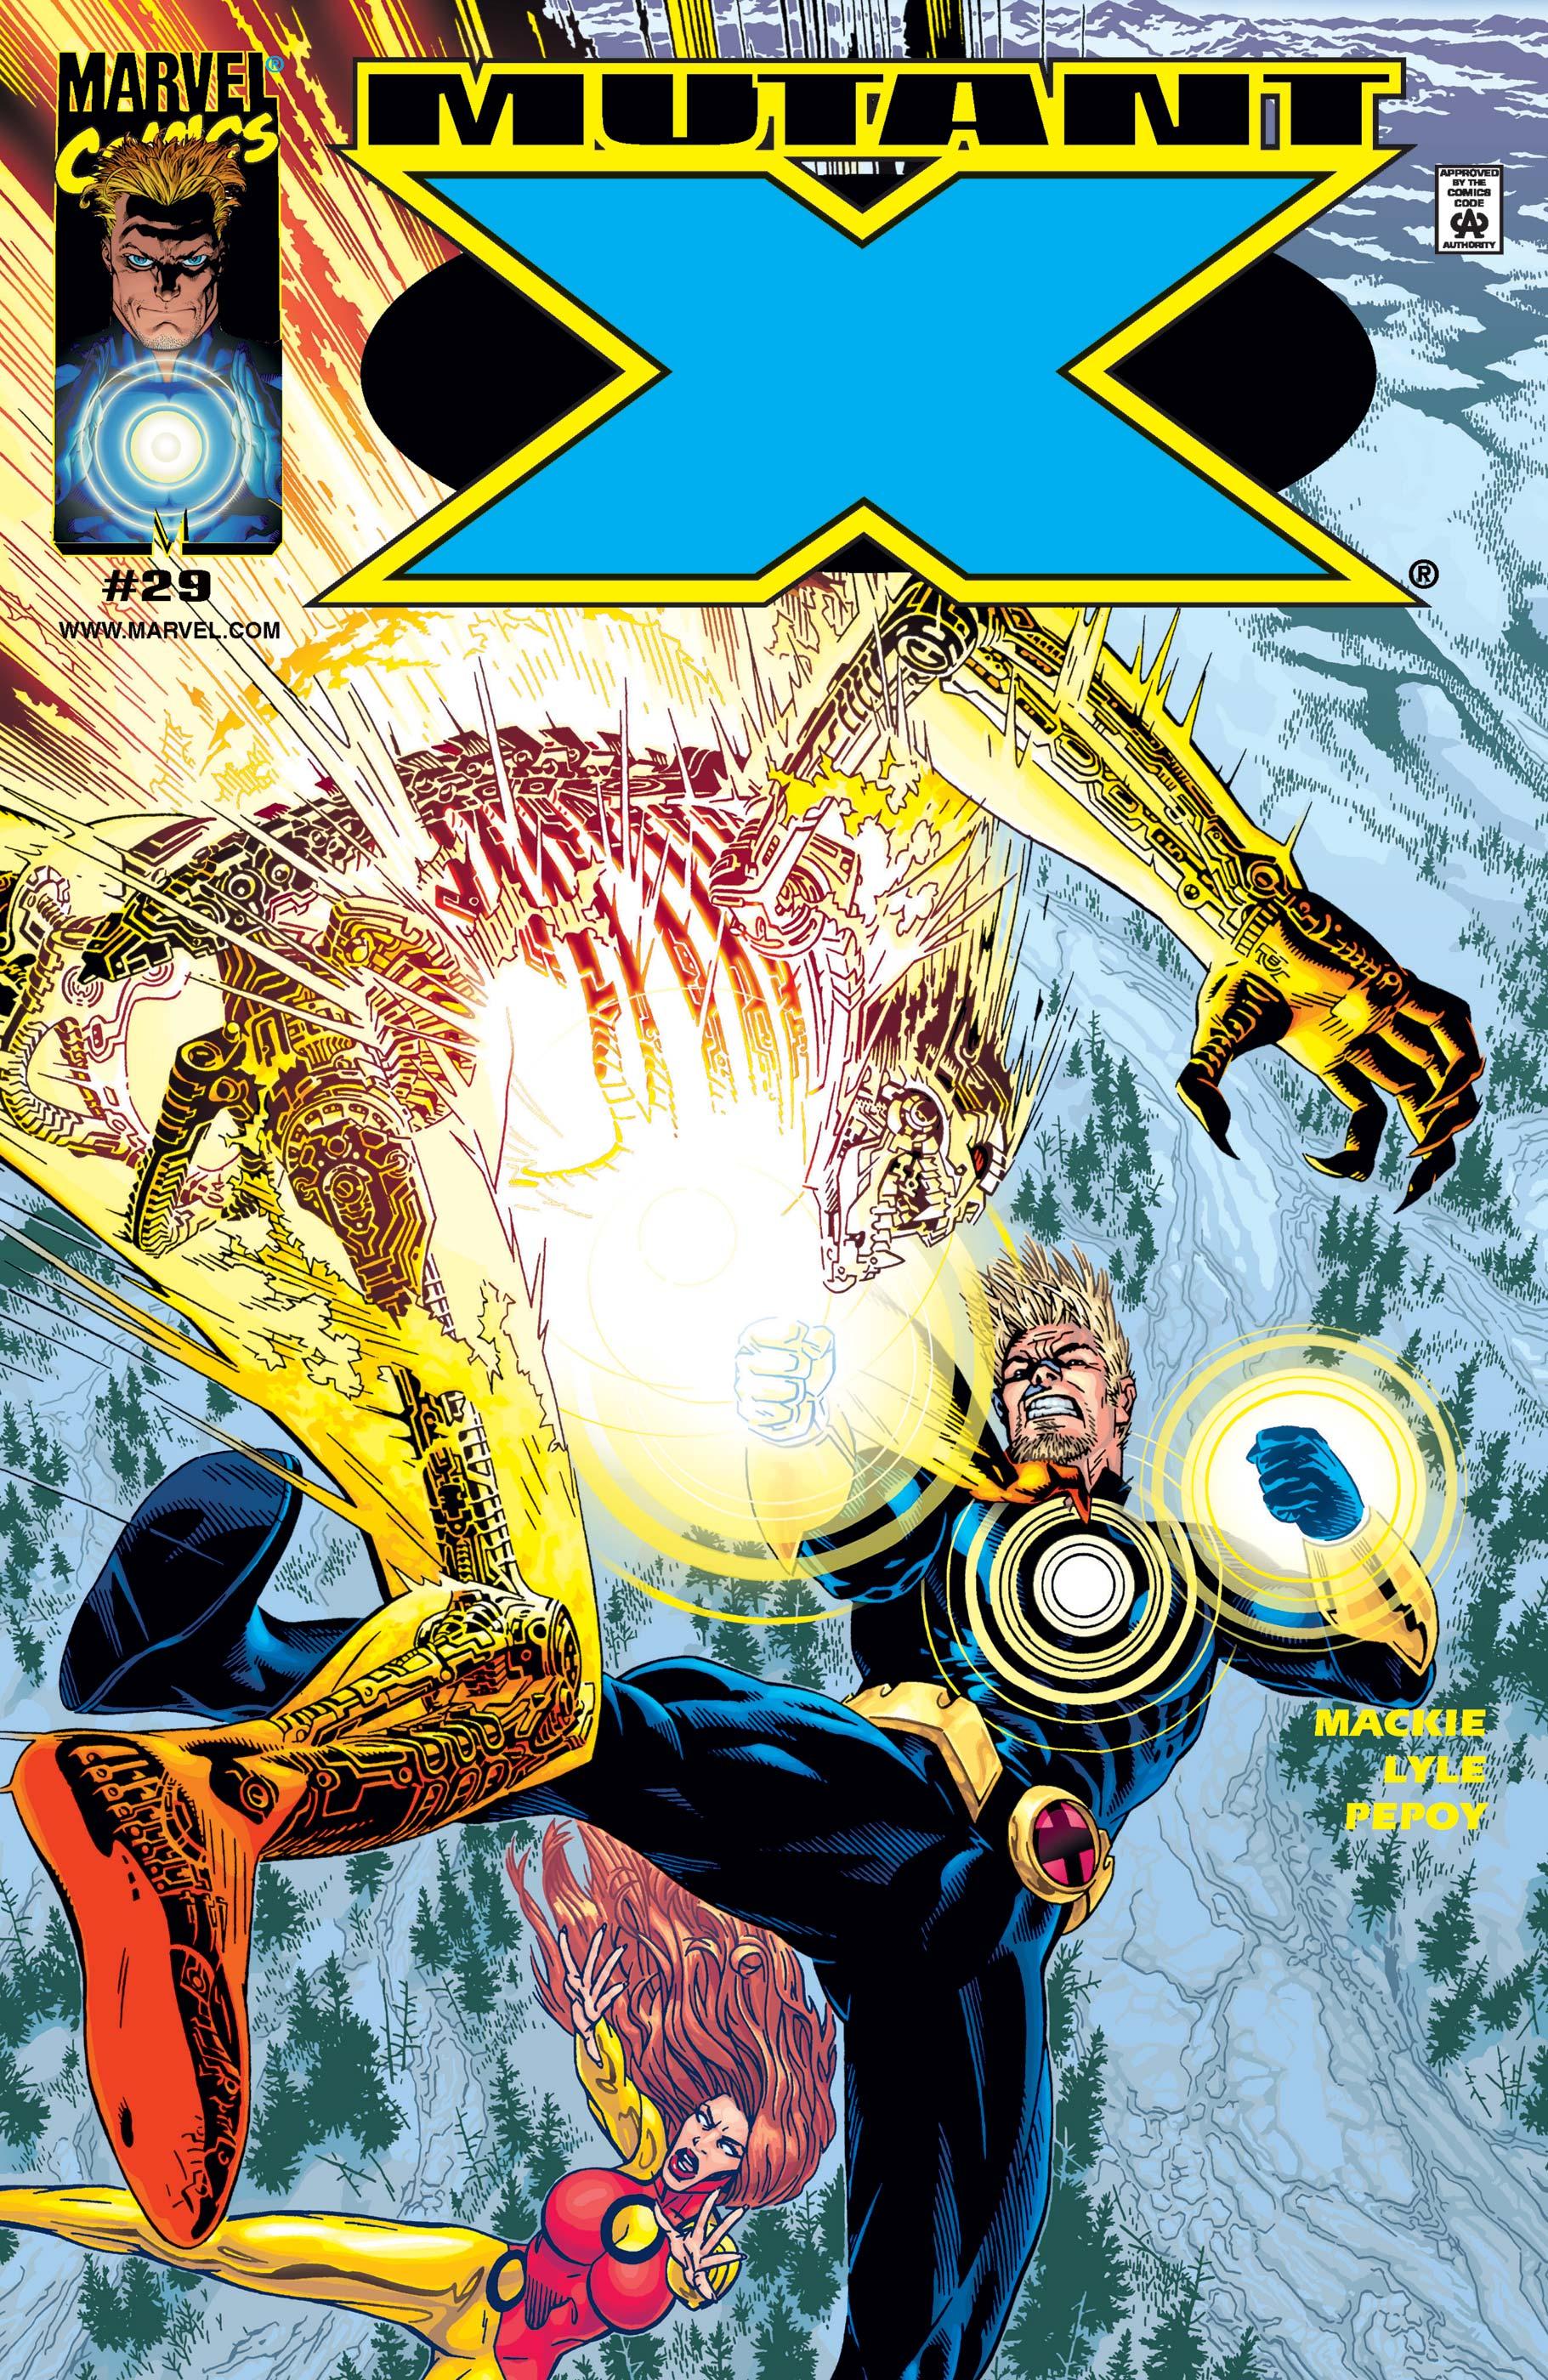 Mutant X (1998) #29